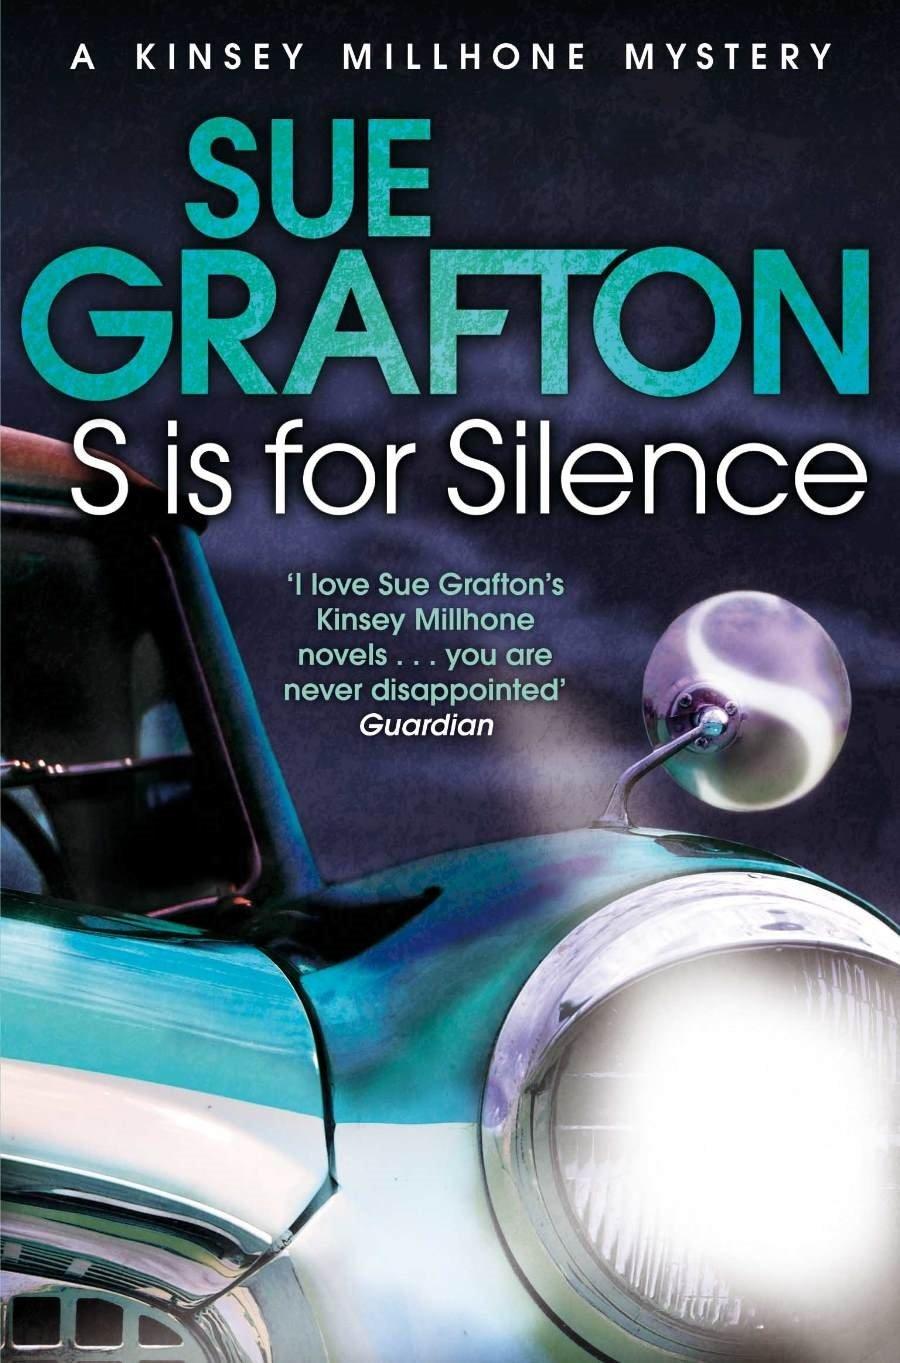 S is for Silence (Kinsey Millhone Alphabet series): Amazon.es: Sue Grafton: Libros en idiomas extranjeros